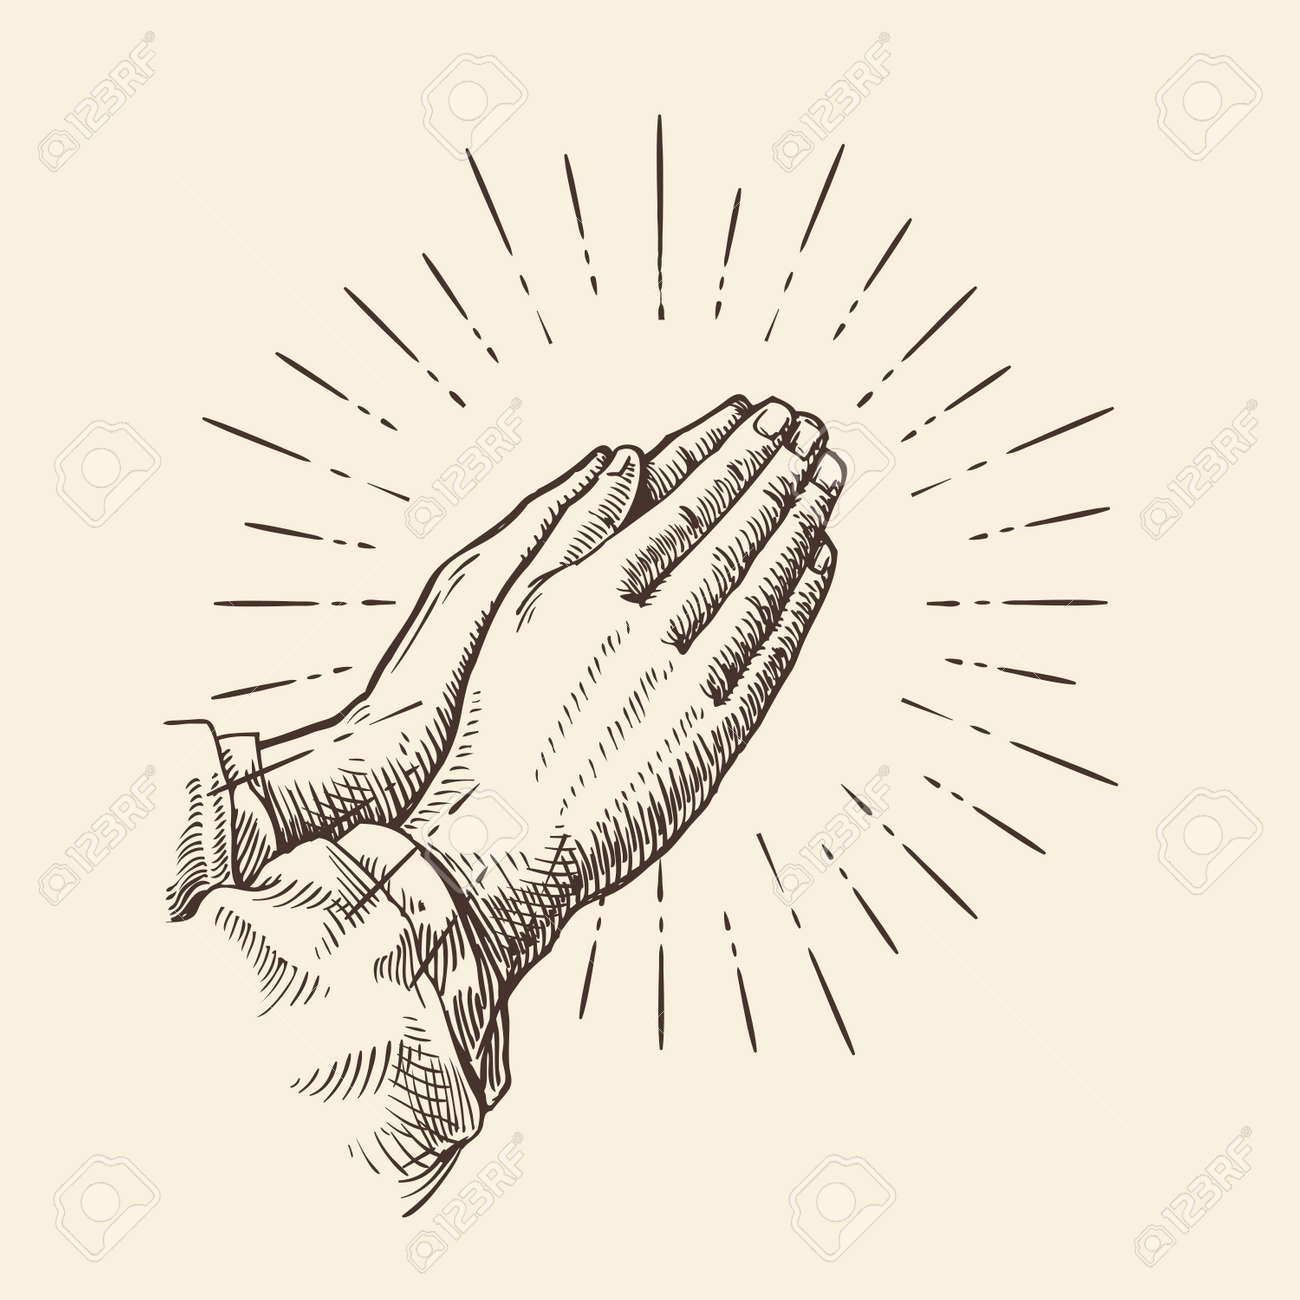 Praying hands. Hand drawn sketch vector illustration - 67209434